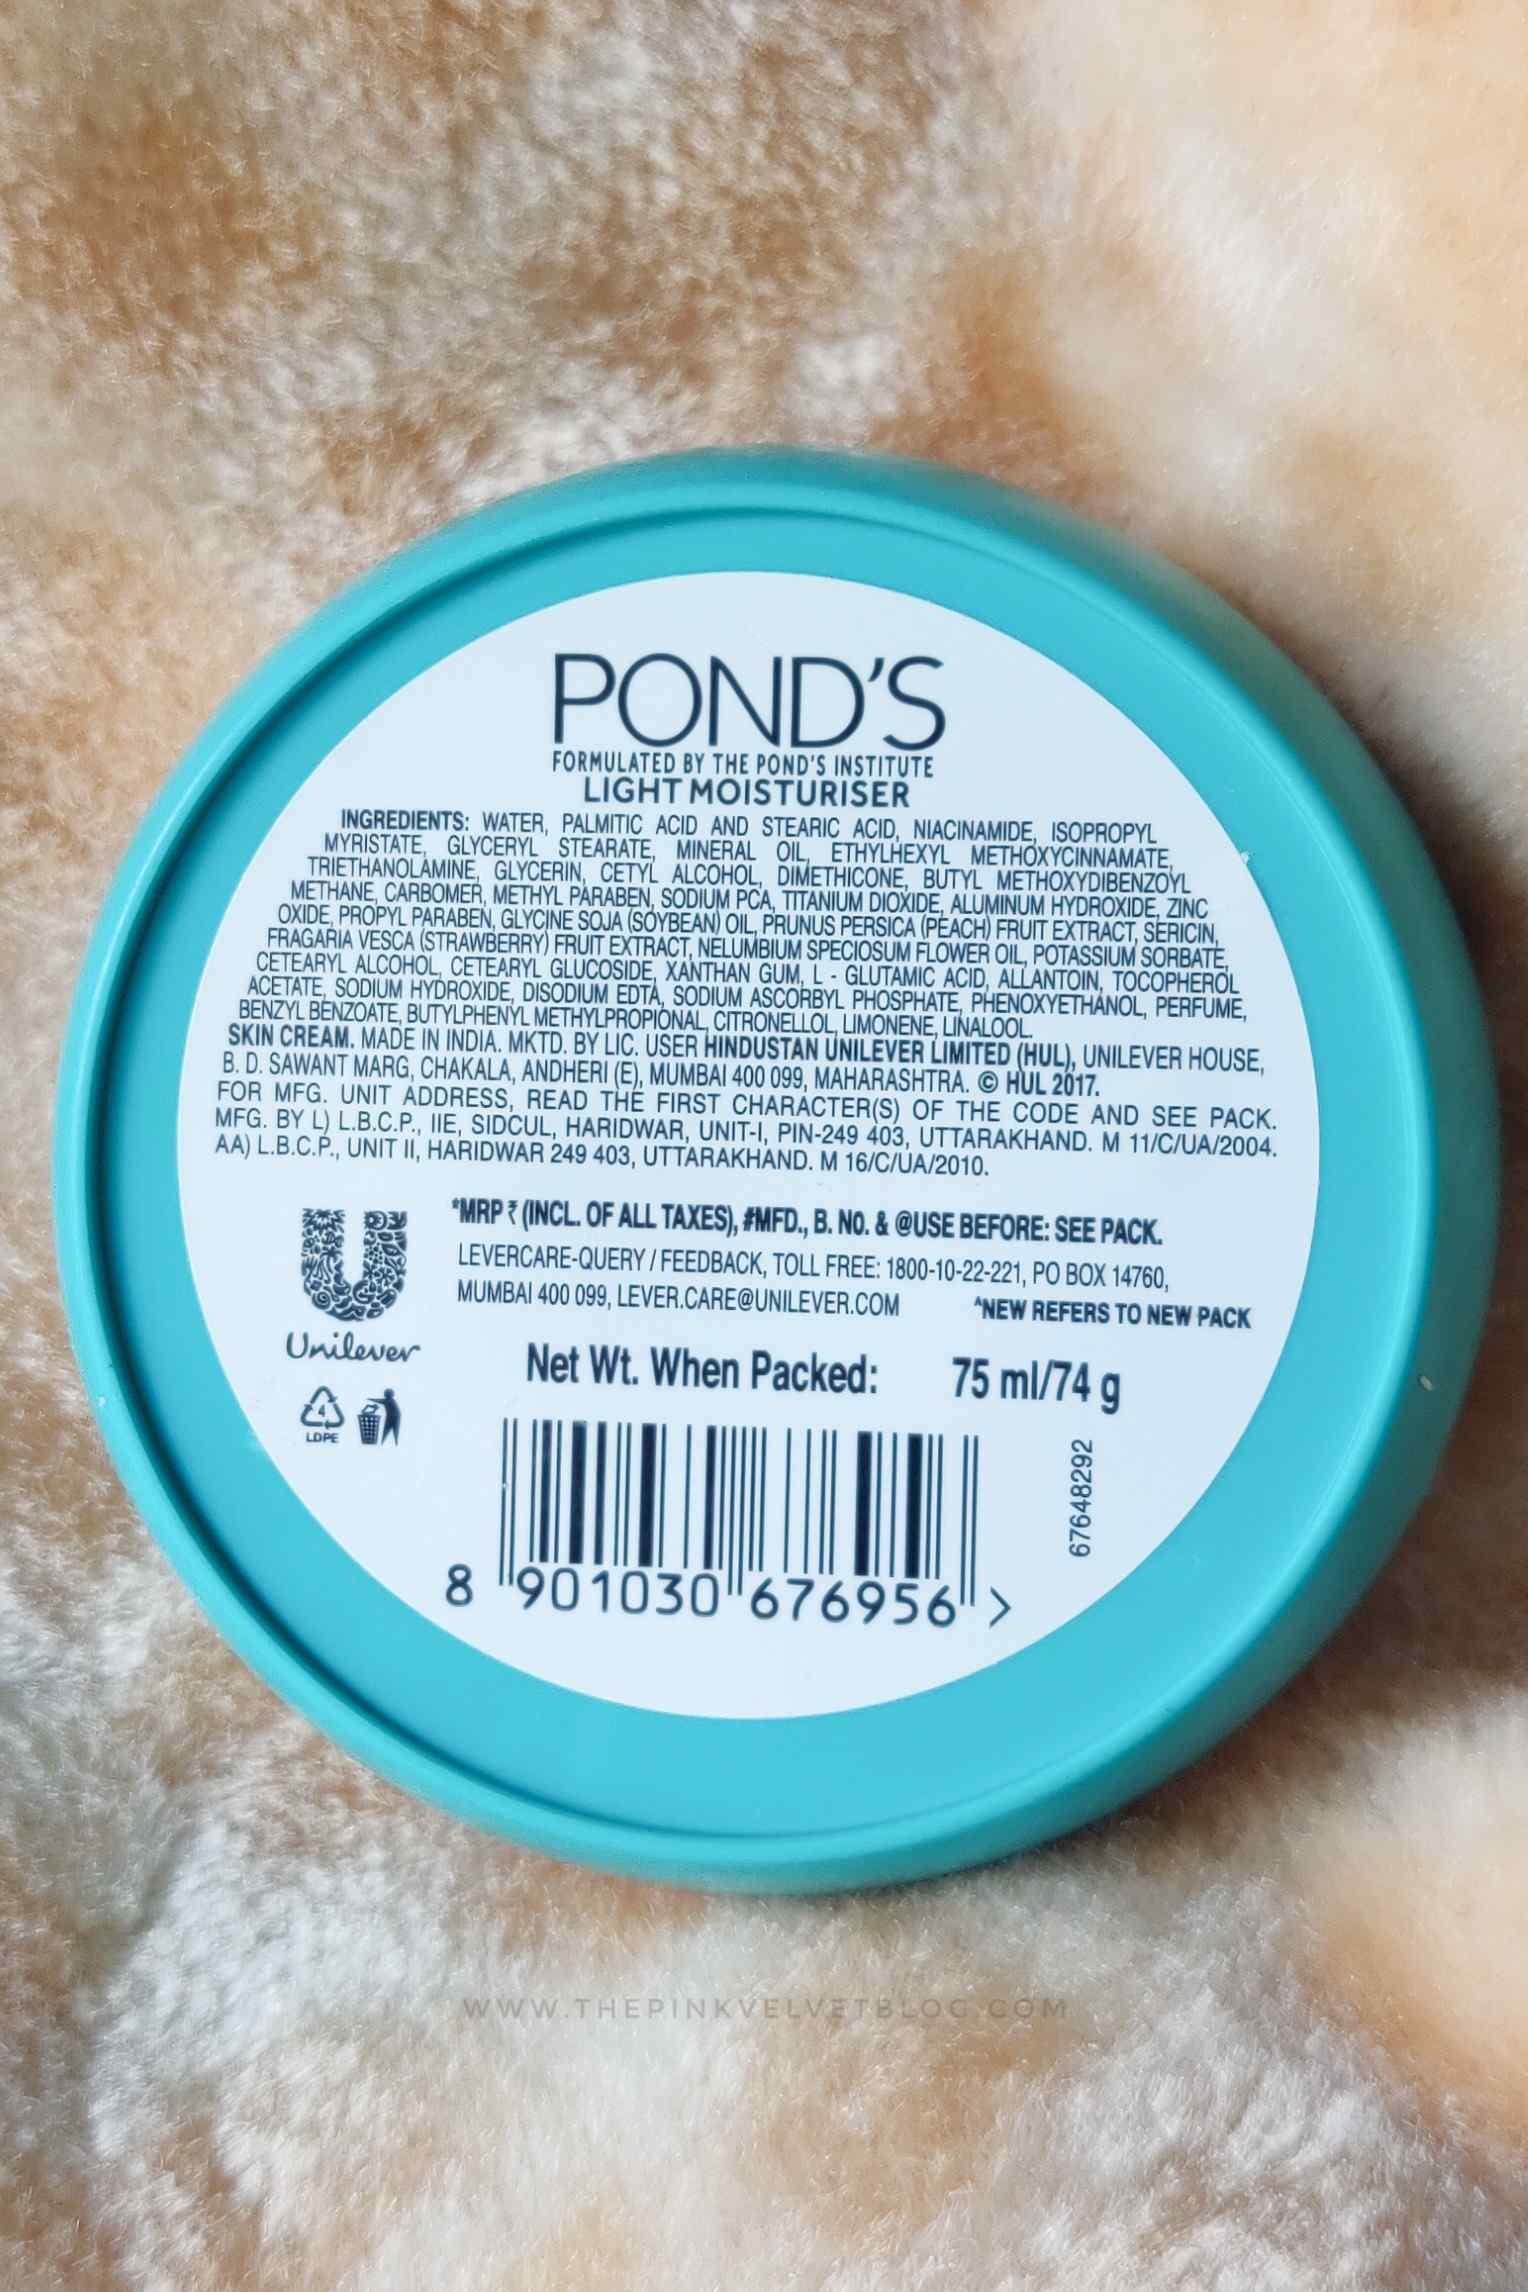 Ponds Light Moisturizer Ingredients Review